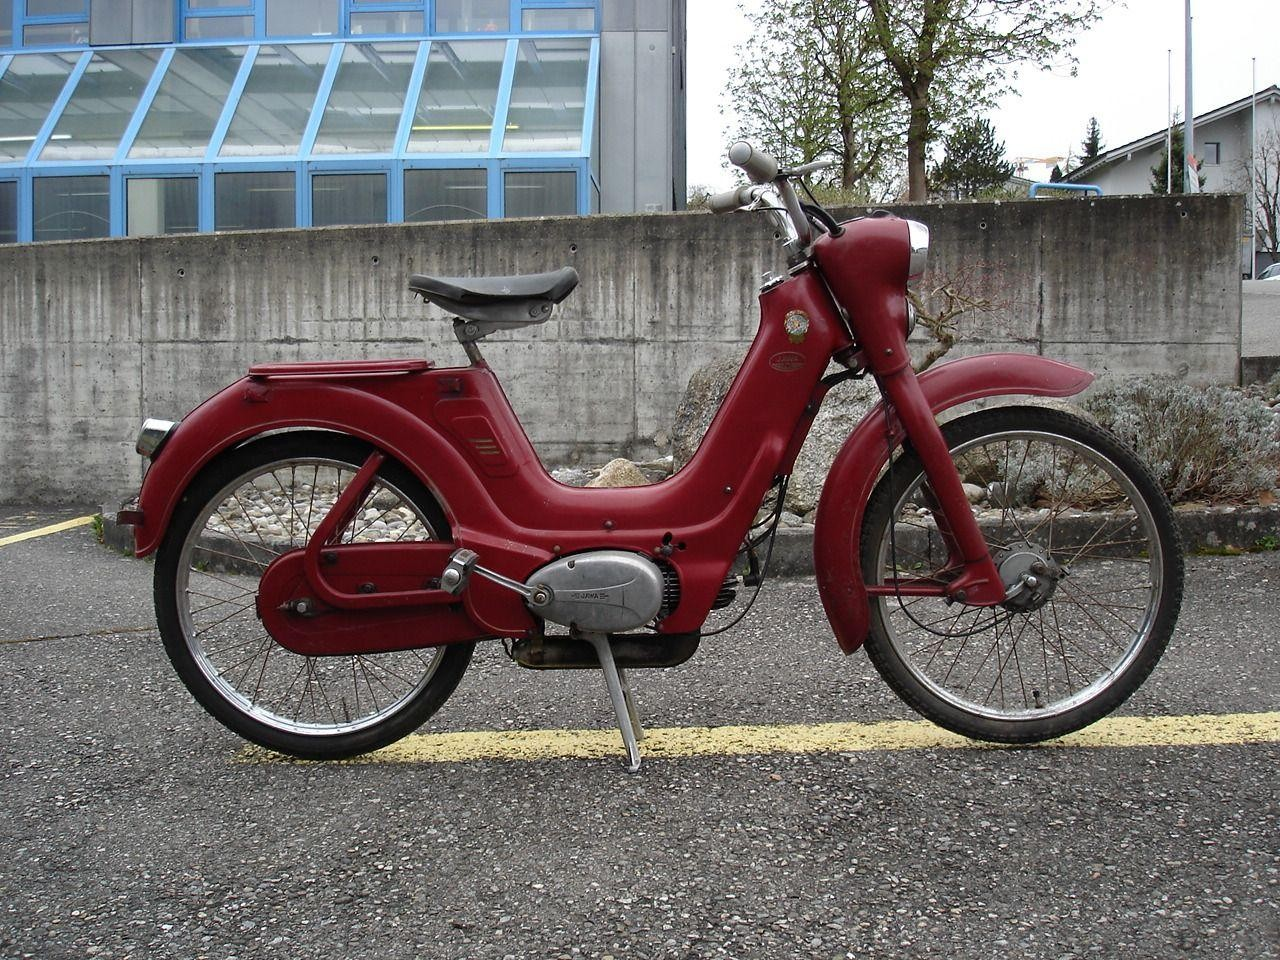 motorrad oldtimer kaufen jawa 551 kleinmotorrad moto. Black Bedroom Furniture Sets. Home Design Ideas